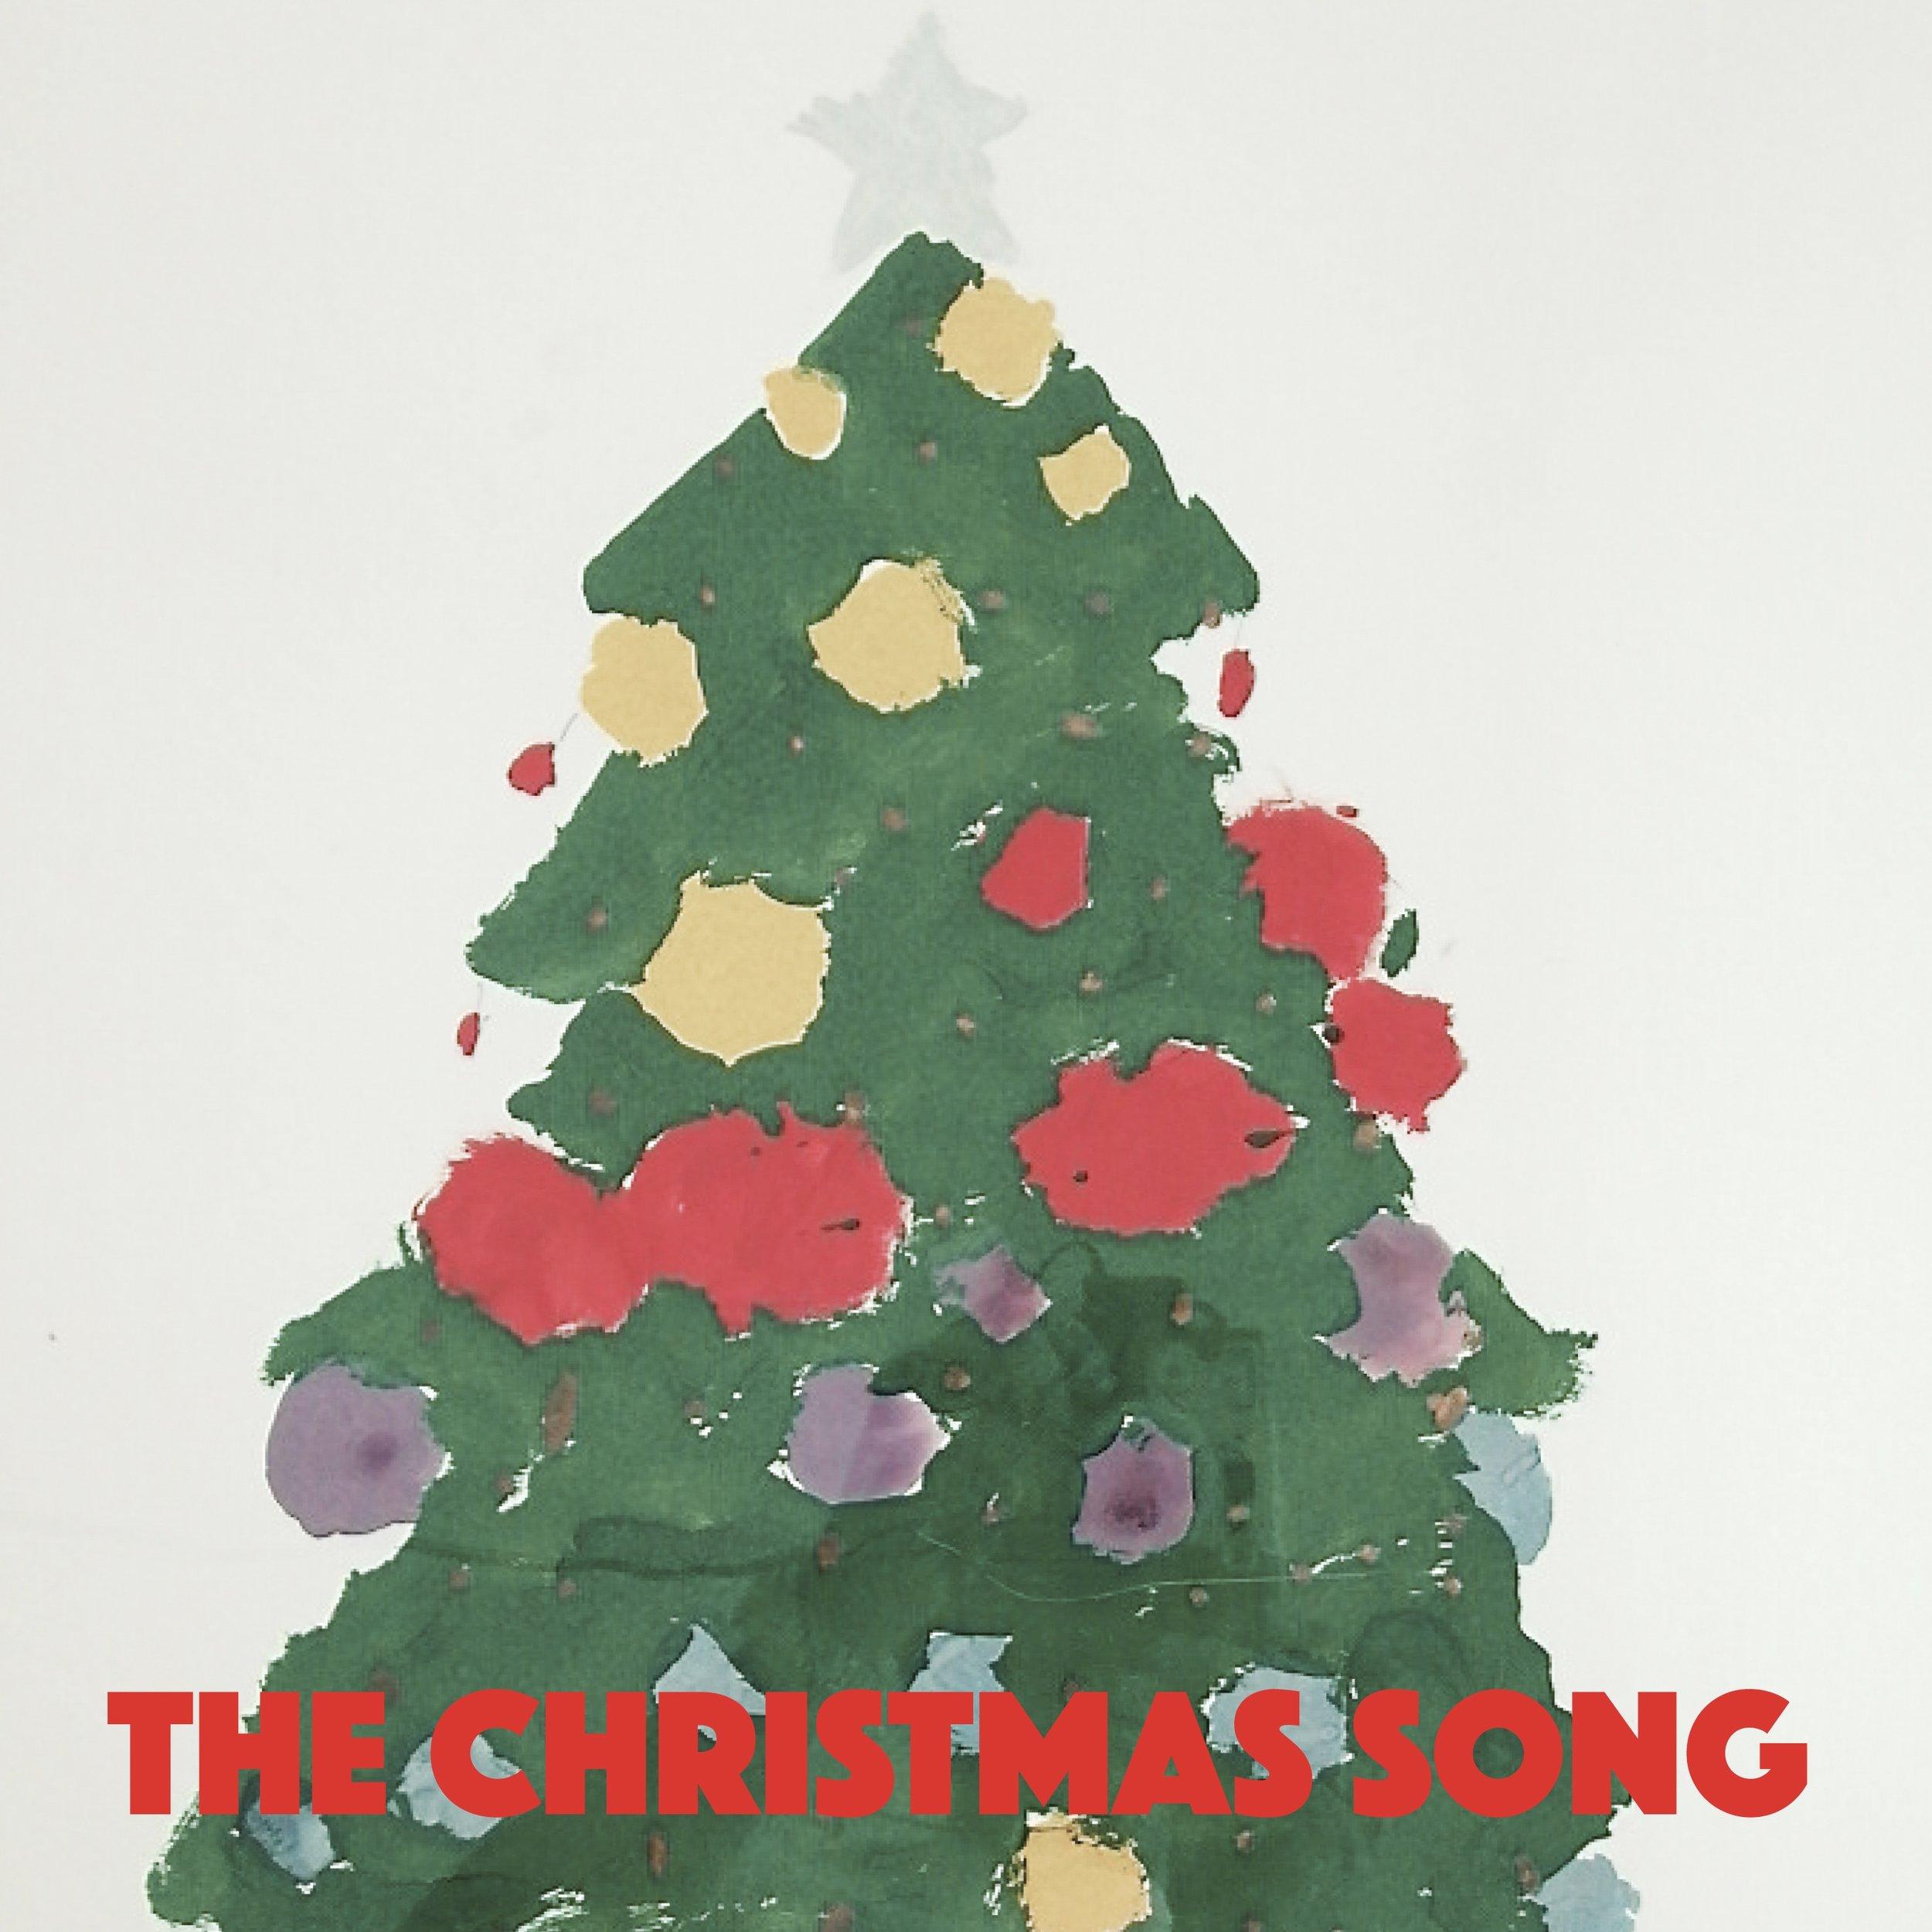 Sadie-Trigg-The-Christmas-Song_edited-1.jpg